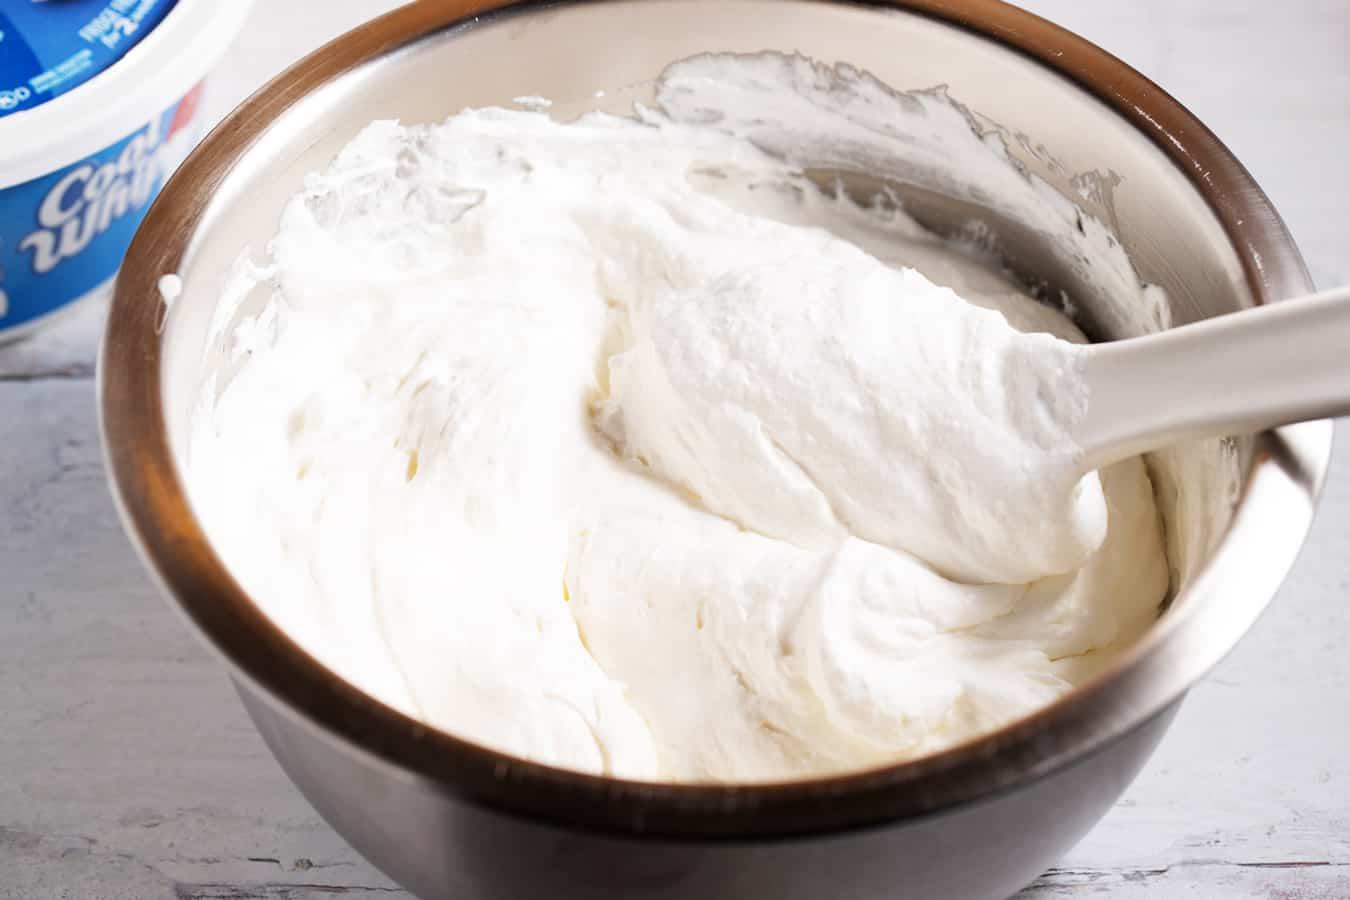 creamy sauce for ambrosia salad